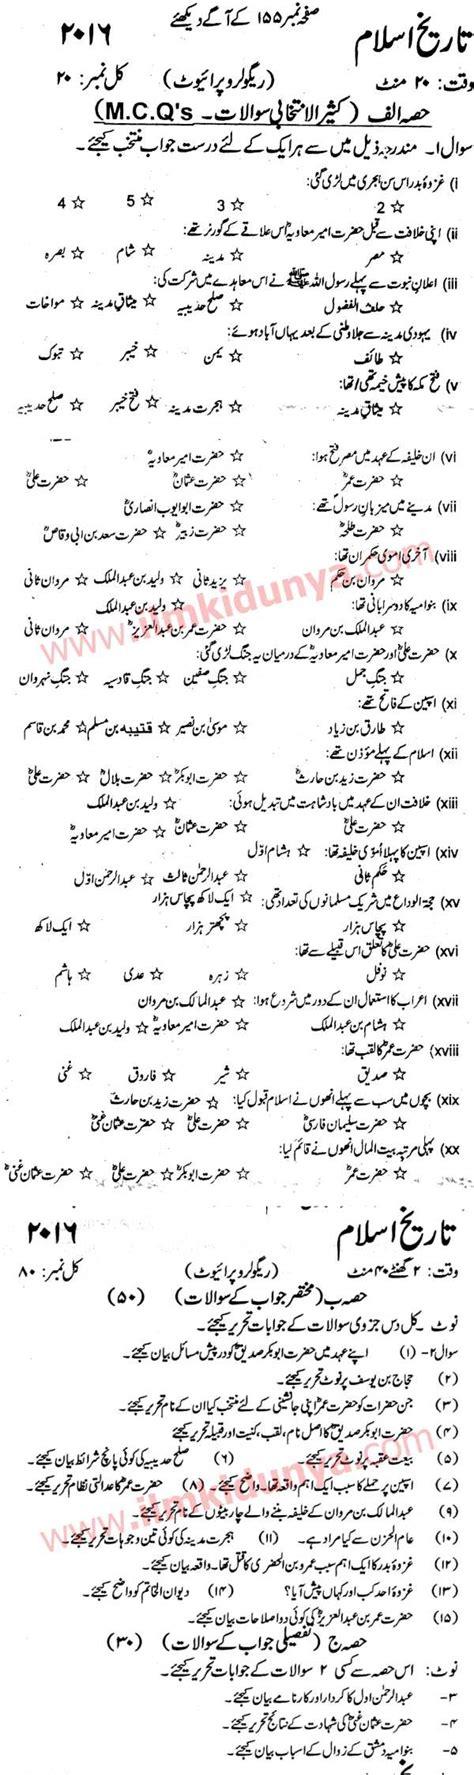 new year history in urdu past papers 2016 karachi board inter part 1 islamic